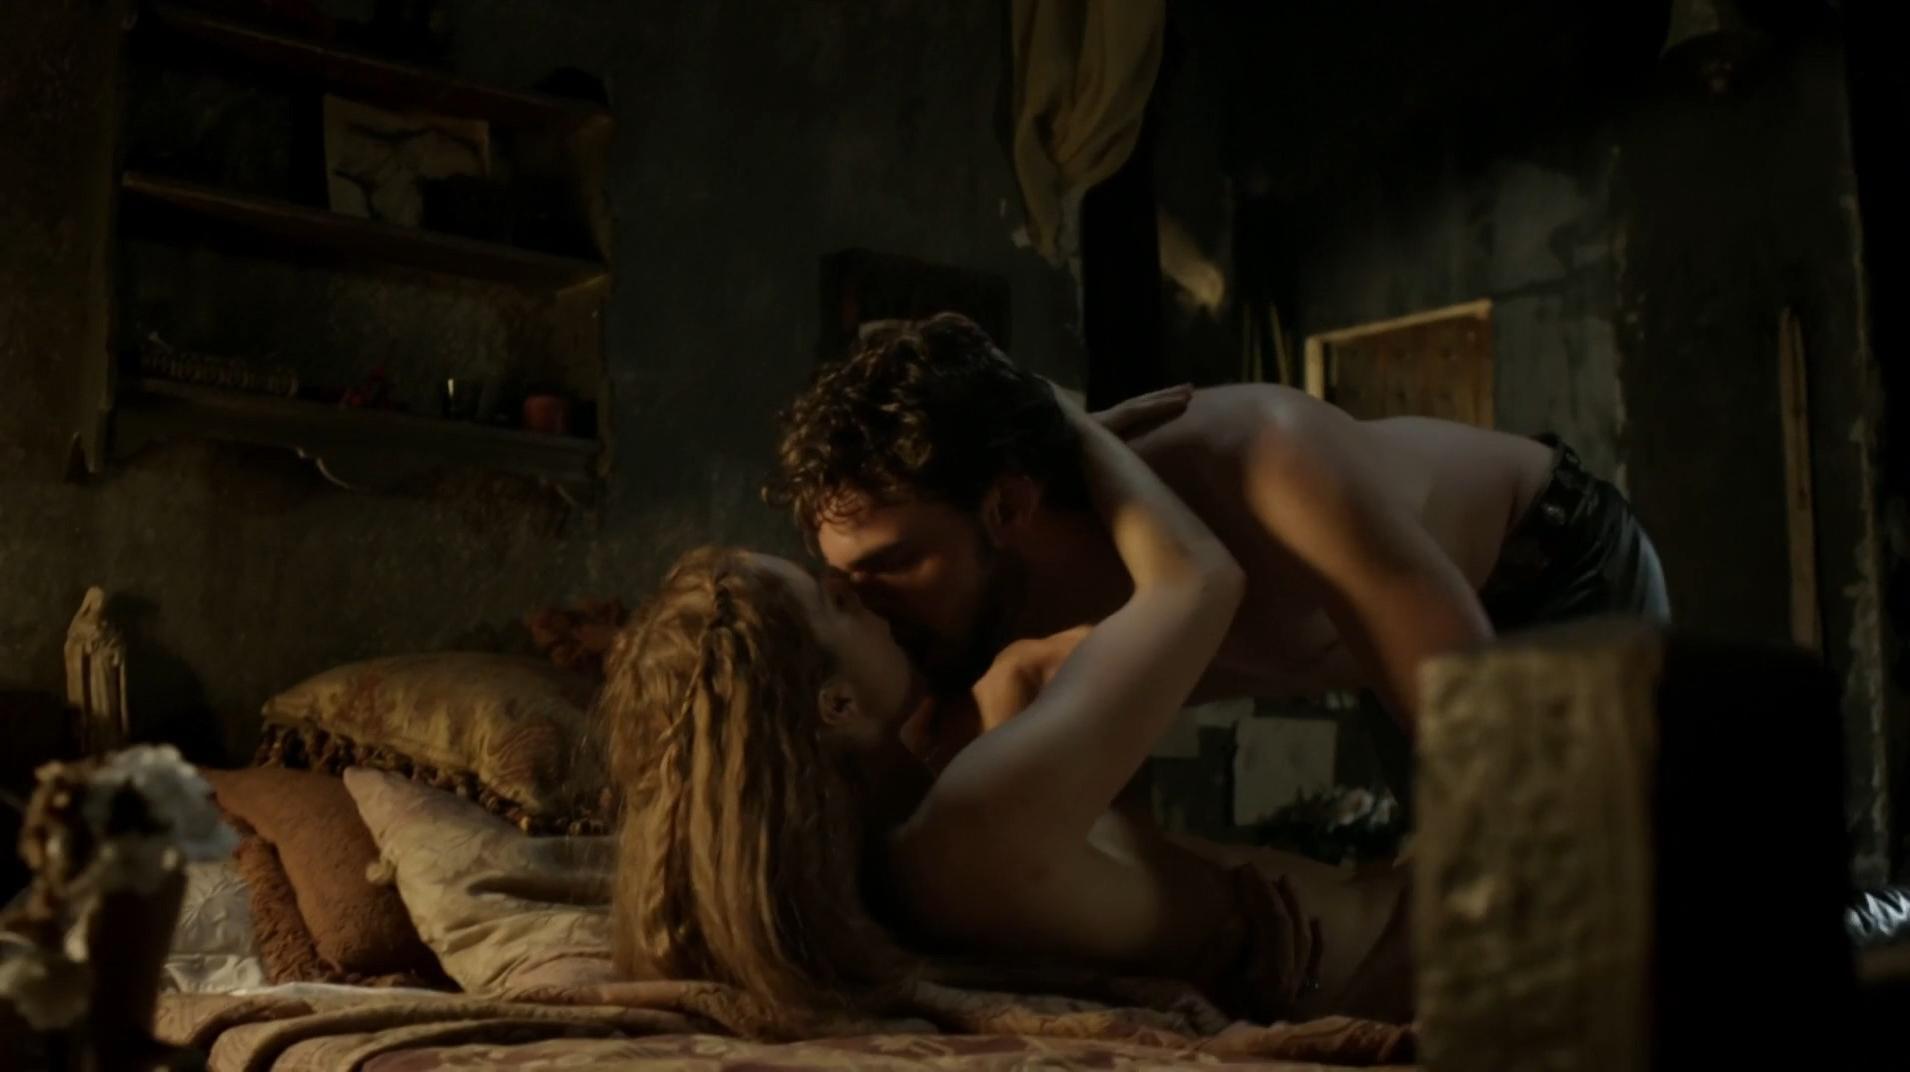 Hera Hilmar nude - Da Vinci's Demons s01 (2013)